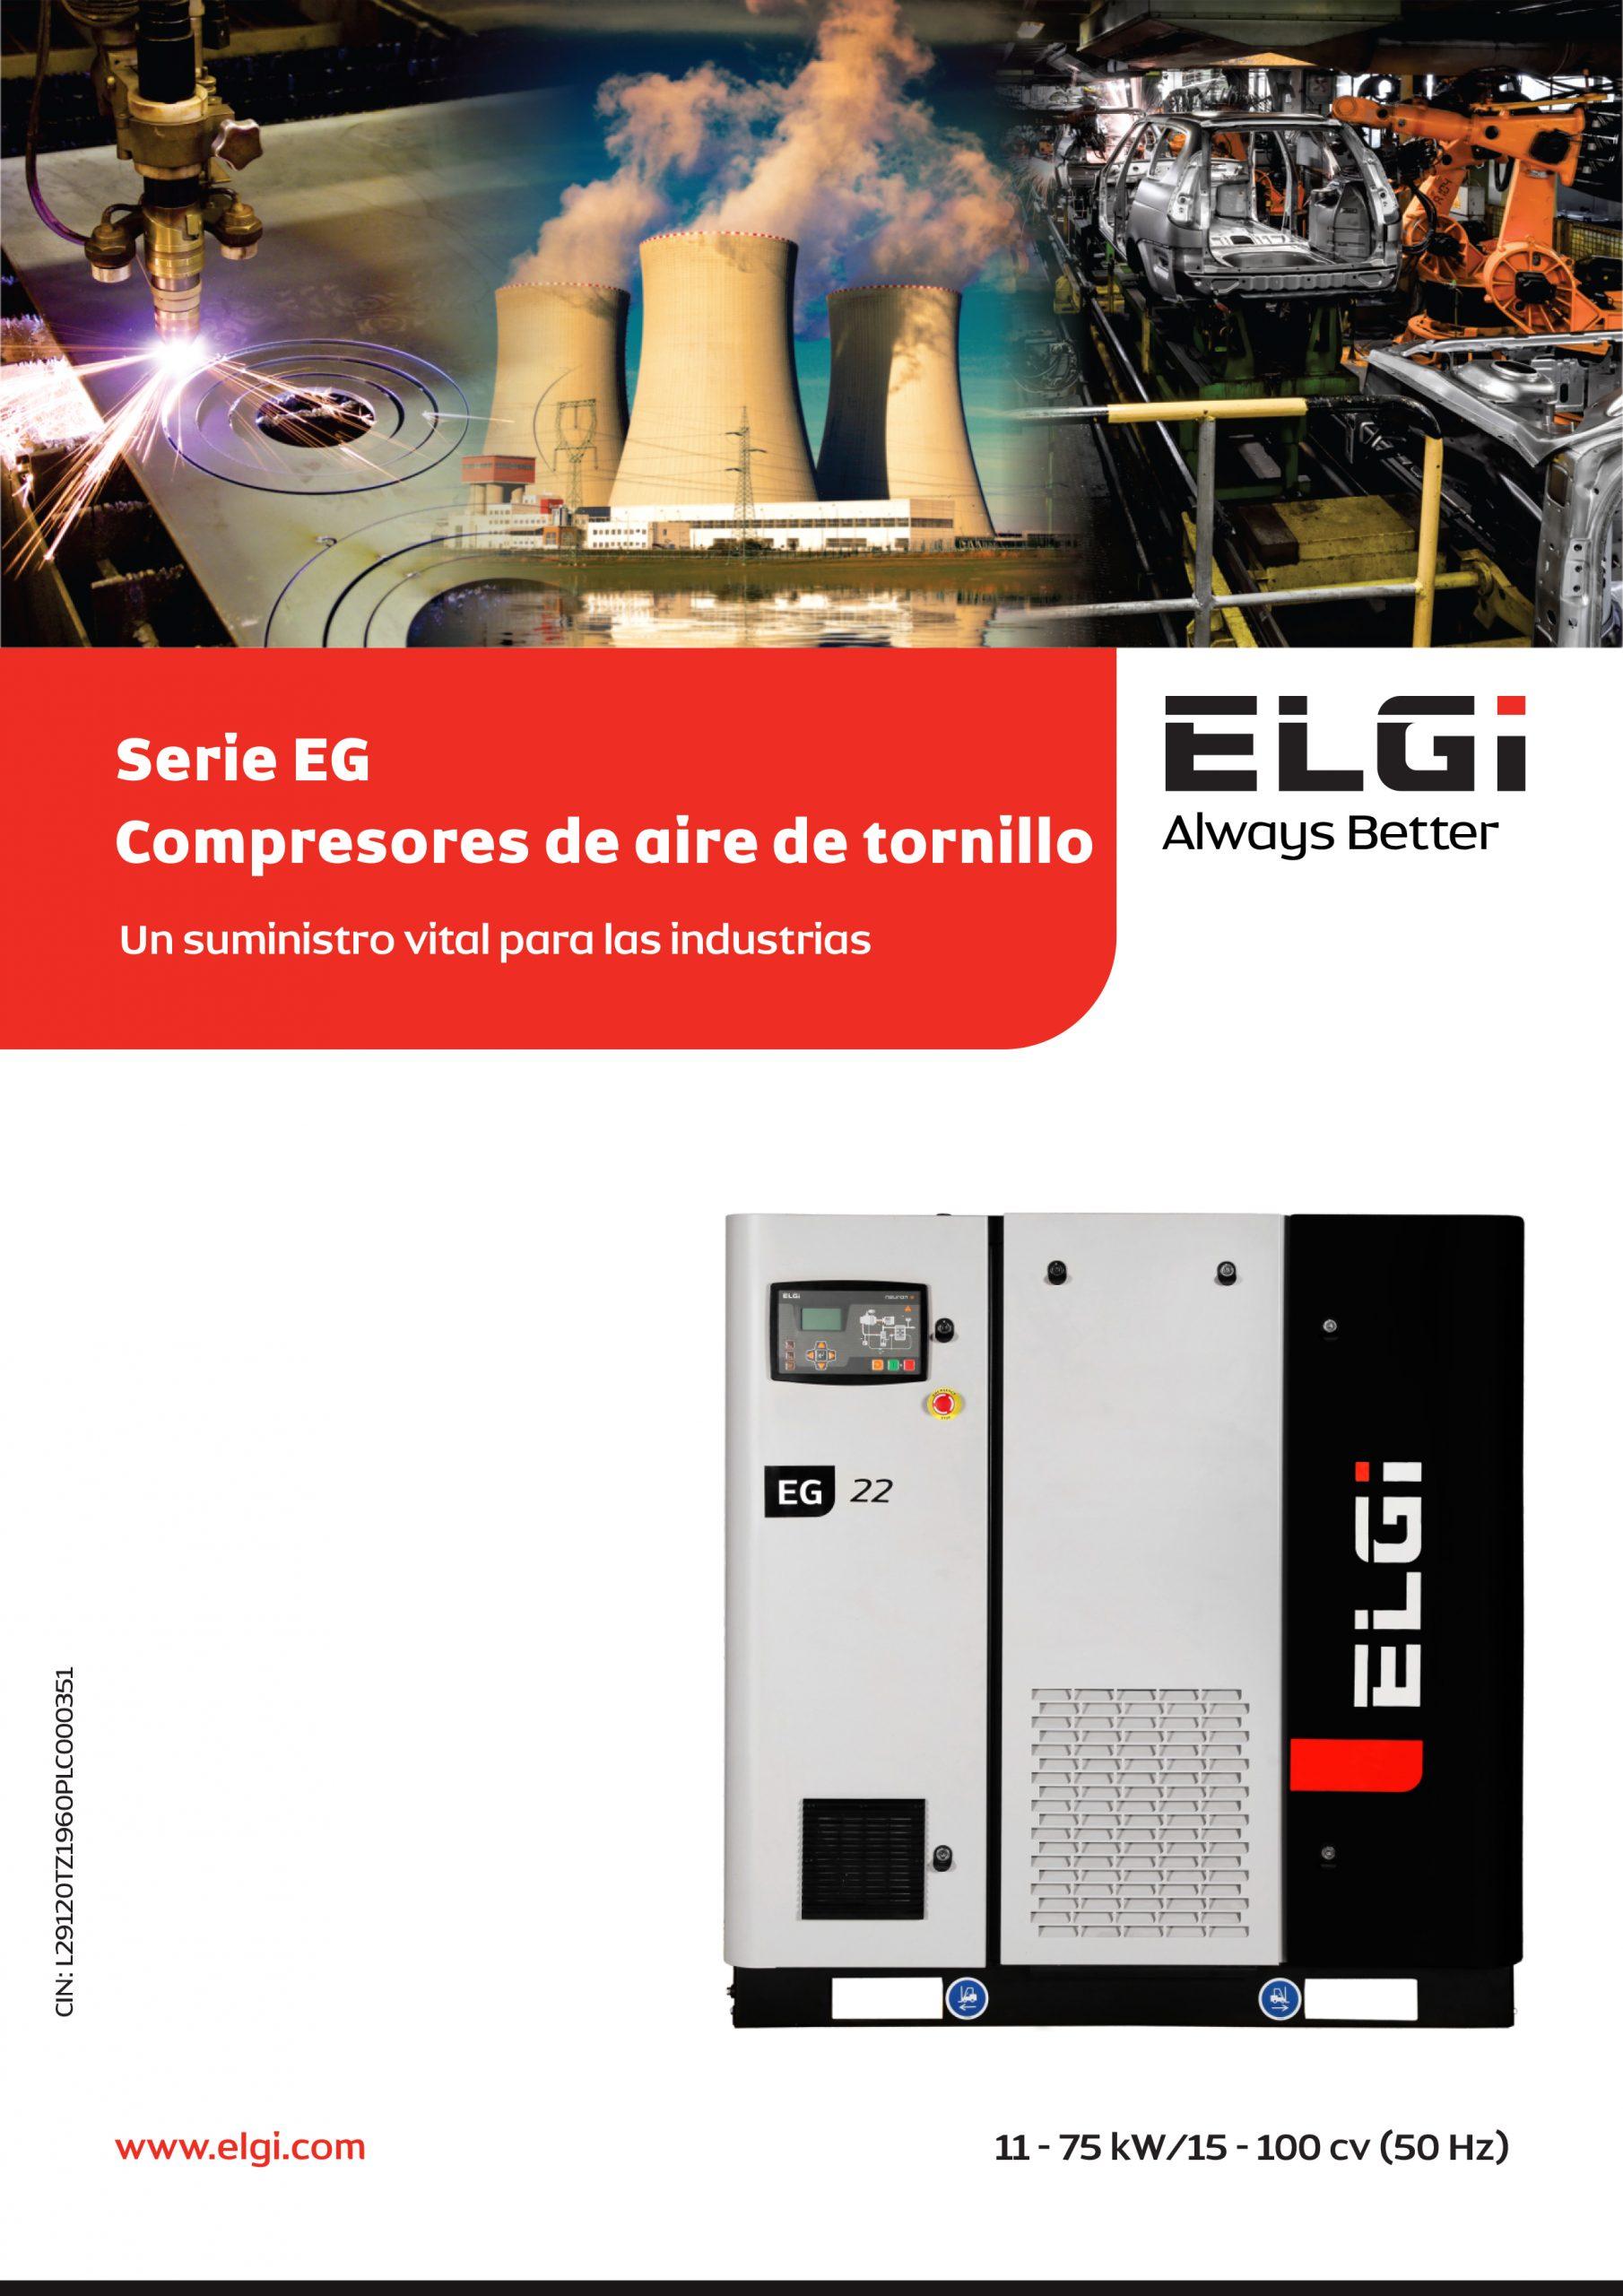 Compresor ELGI serie EG